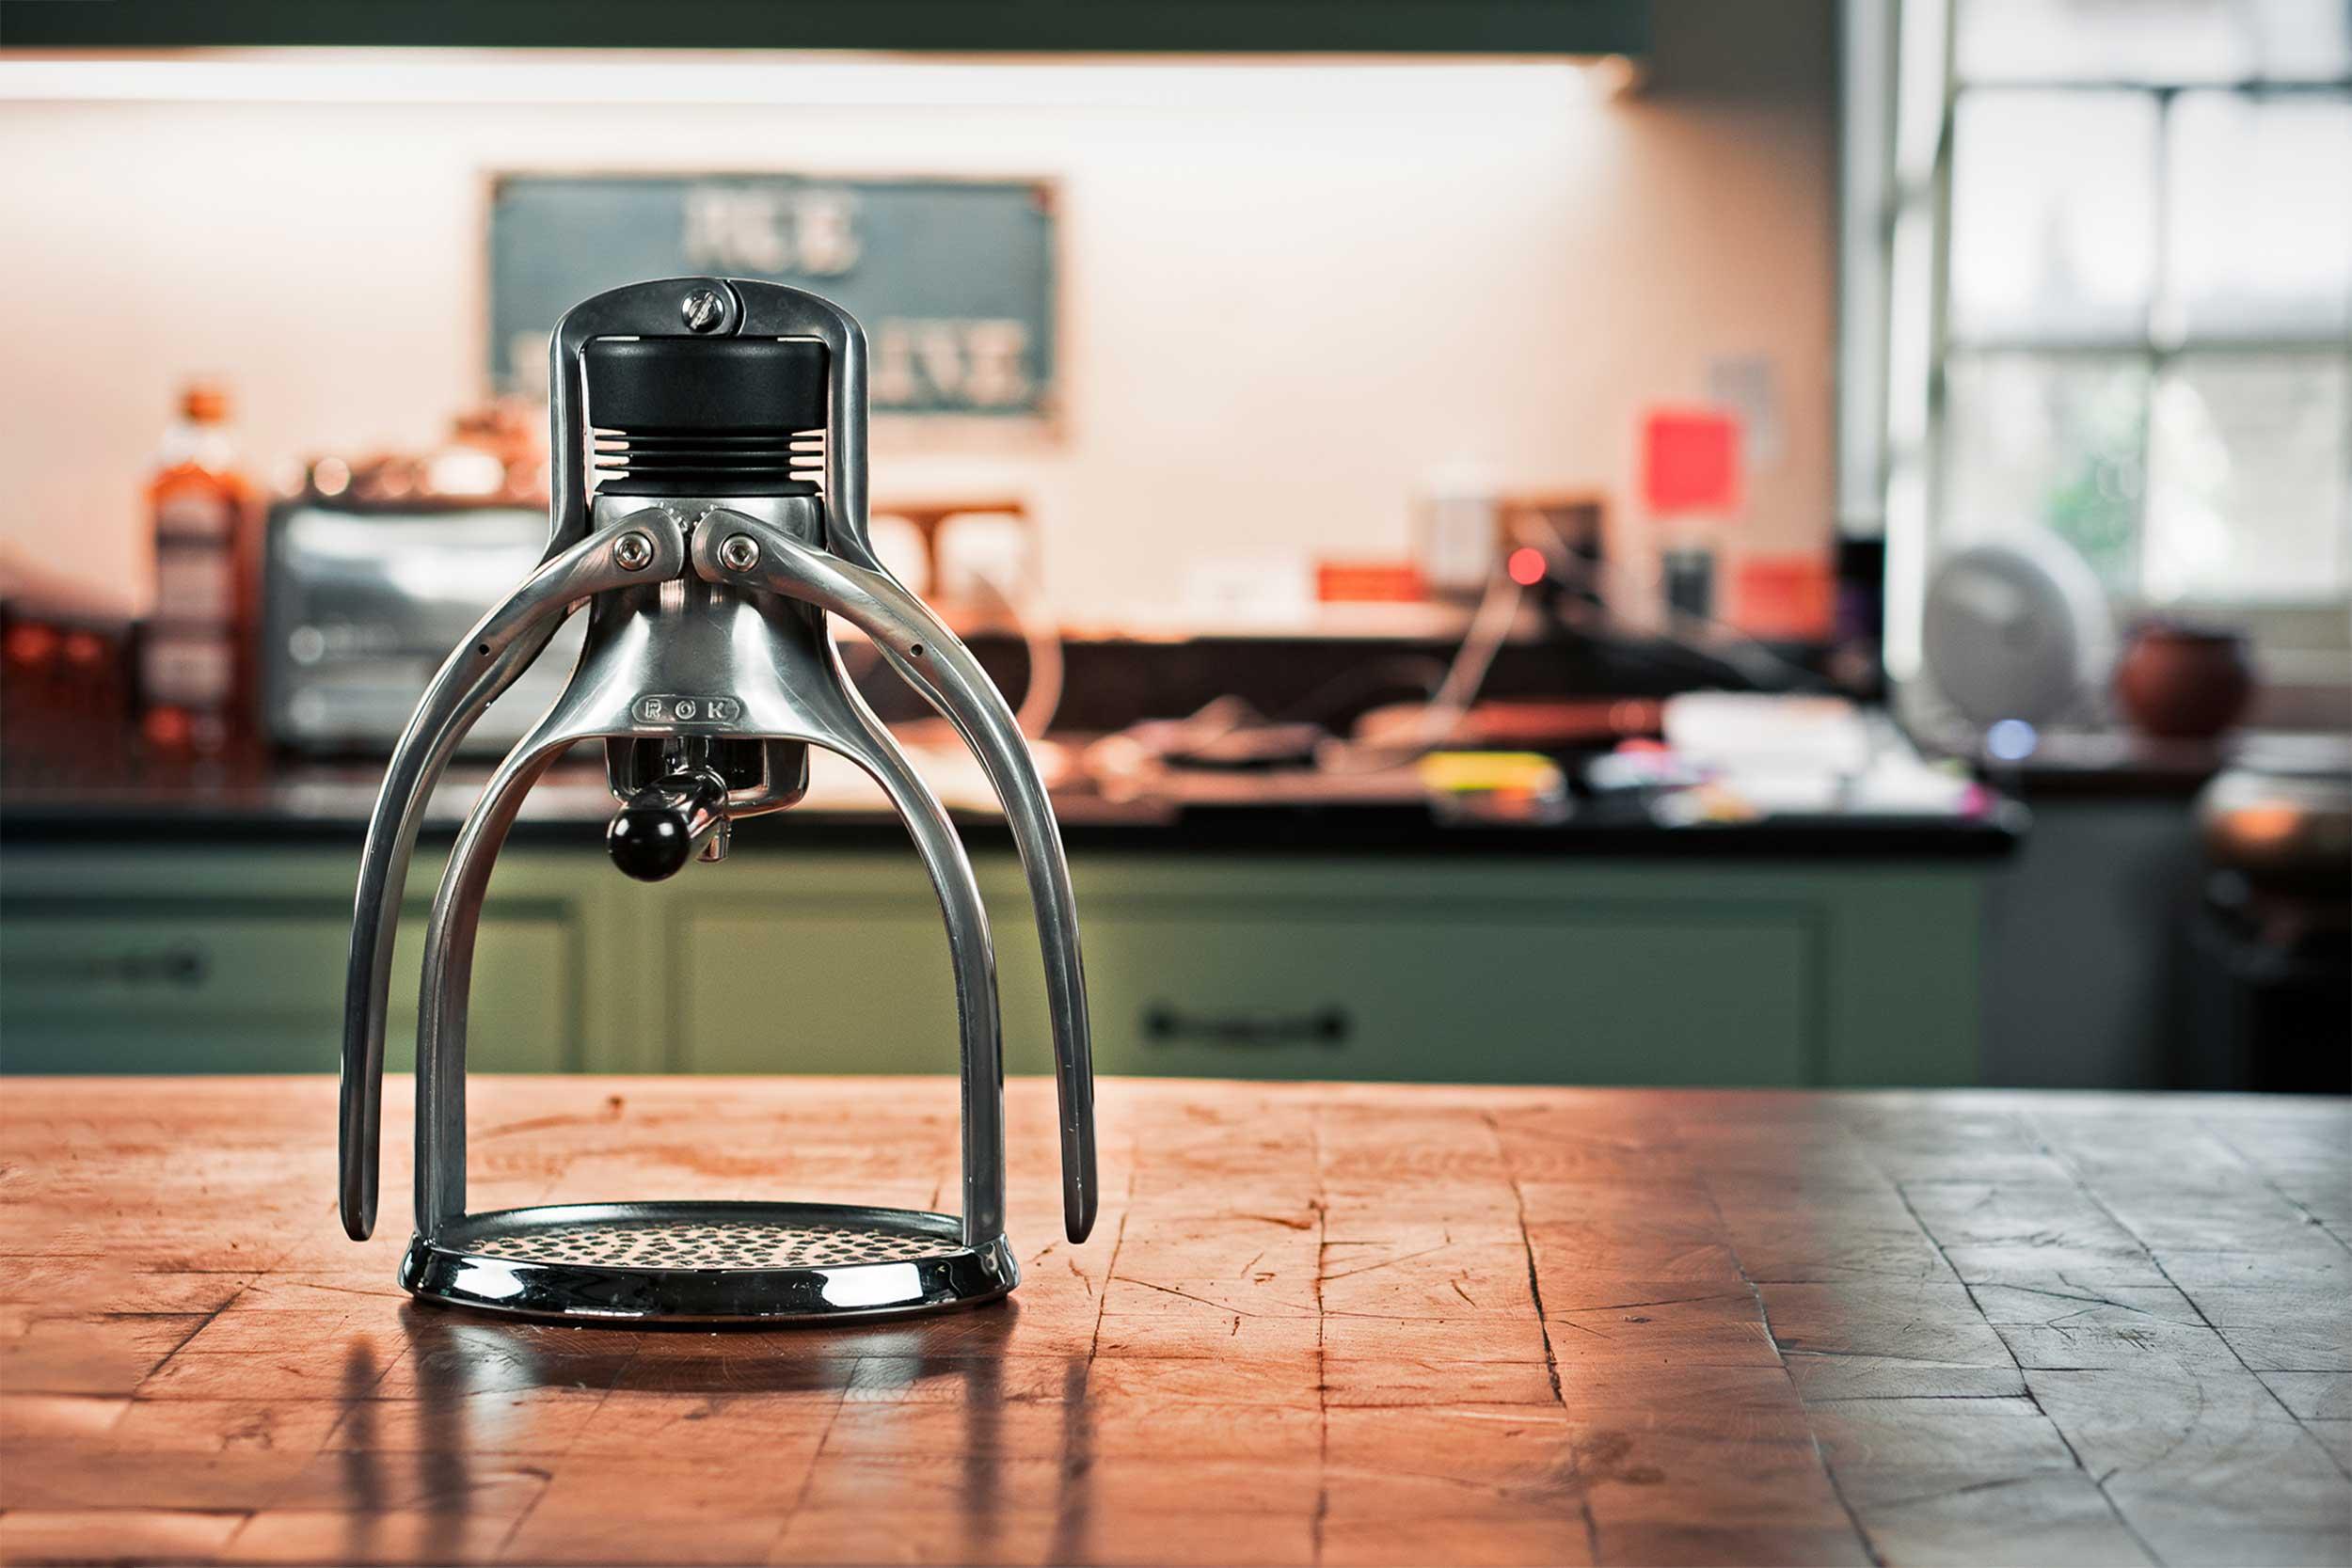 ROK EspressoGC on kitchen counter